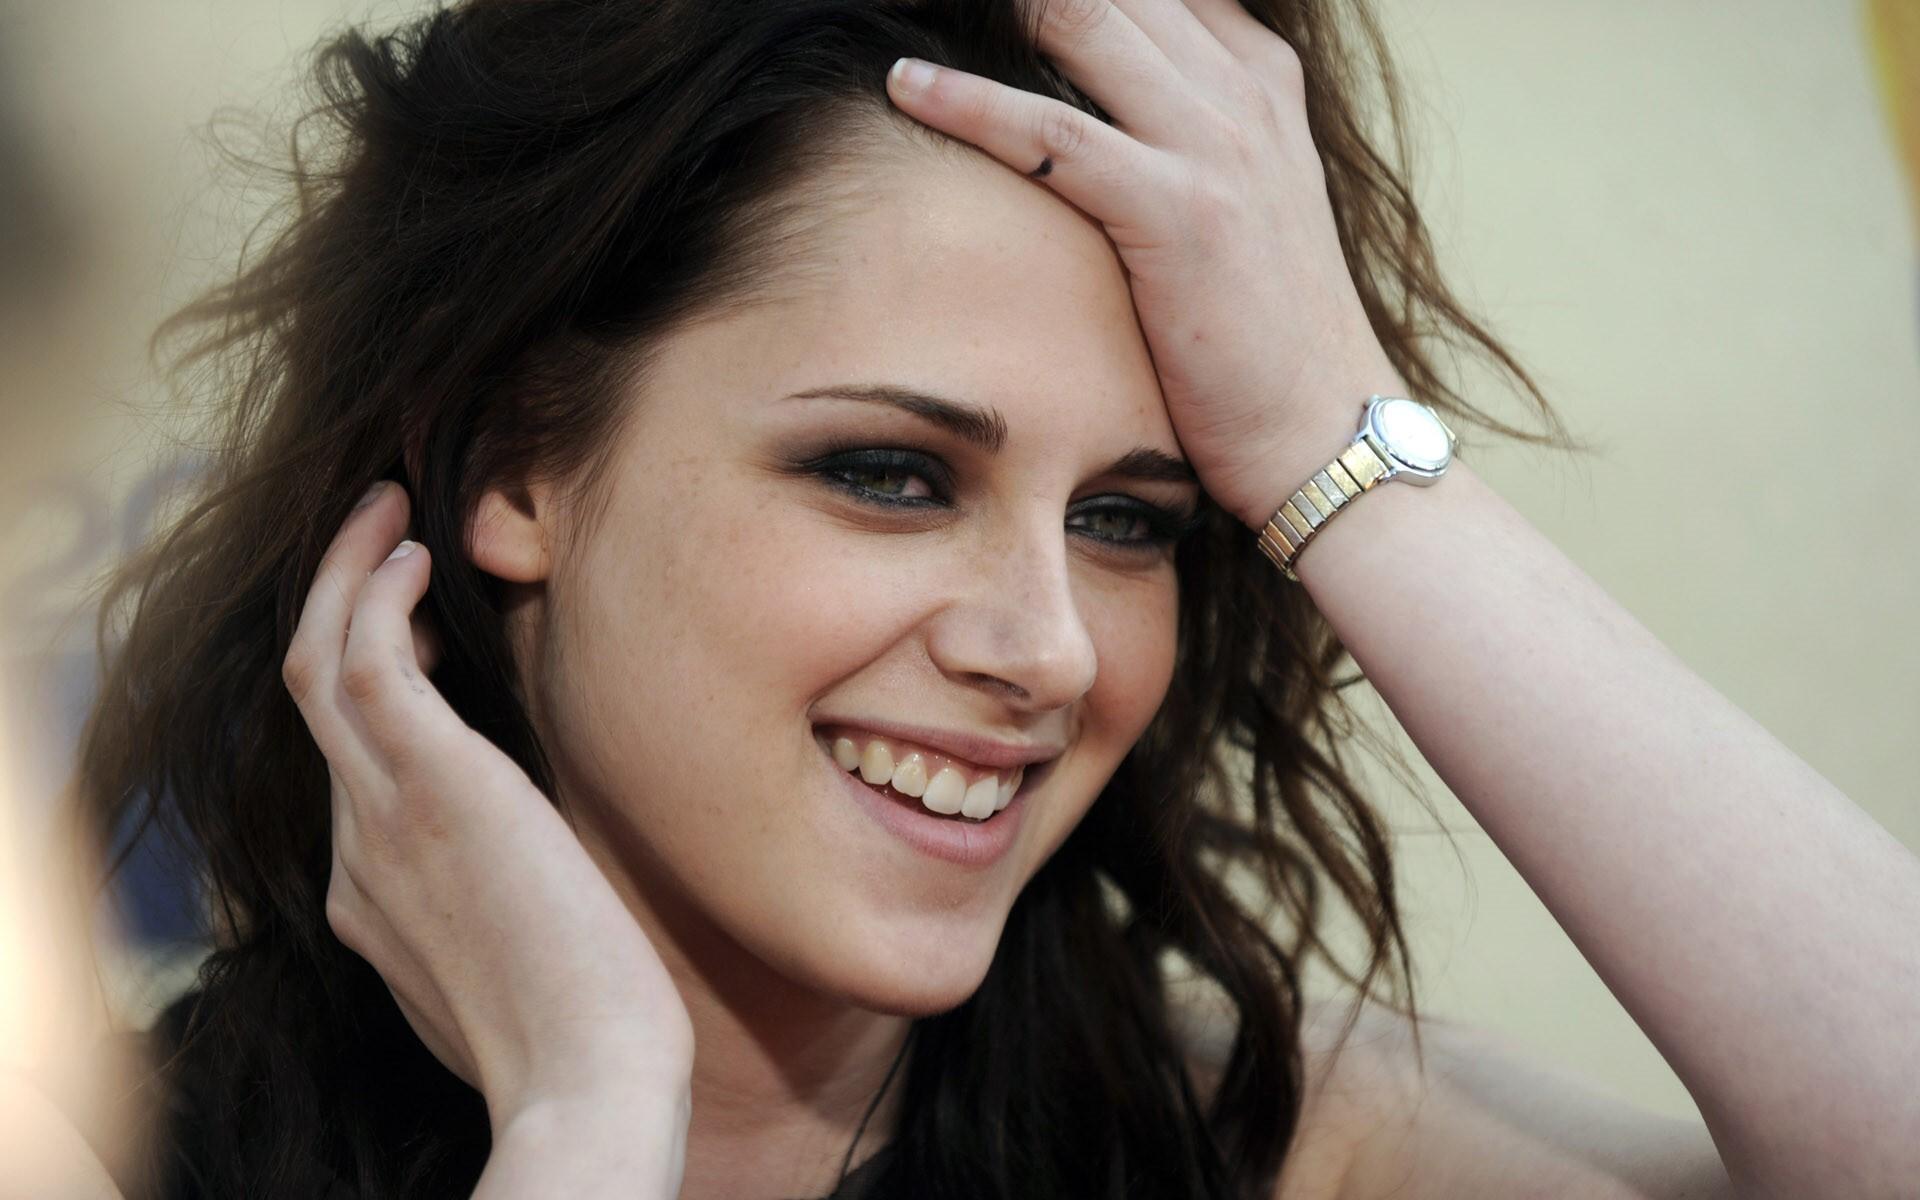 beautiful hollywood actress hd wallpapers - photo #1